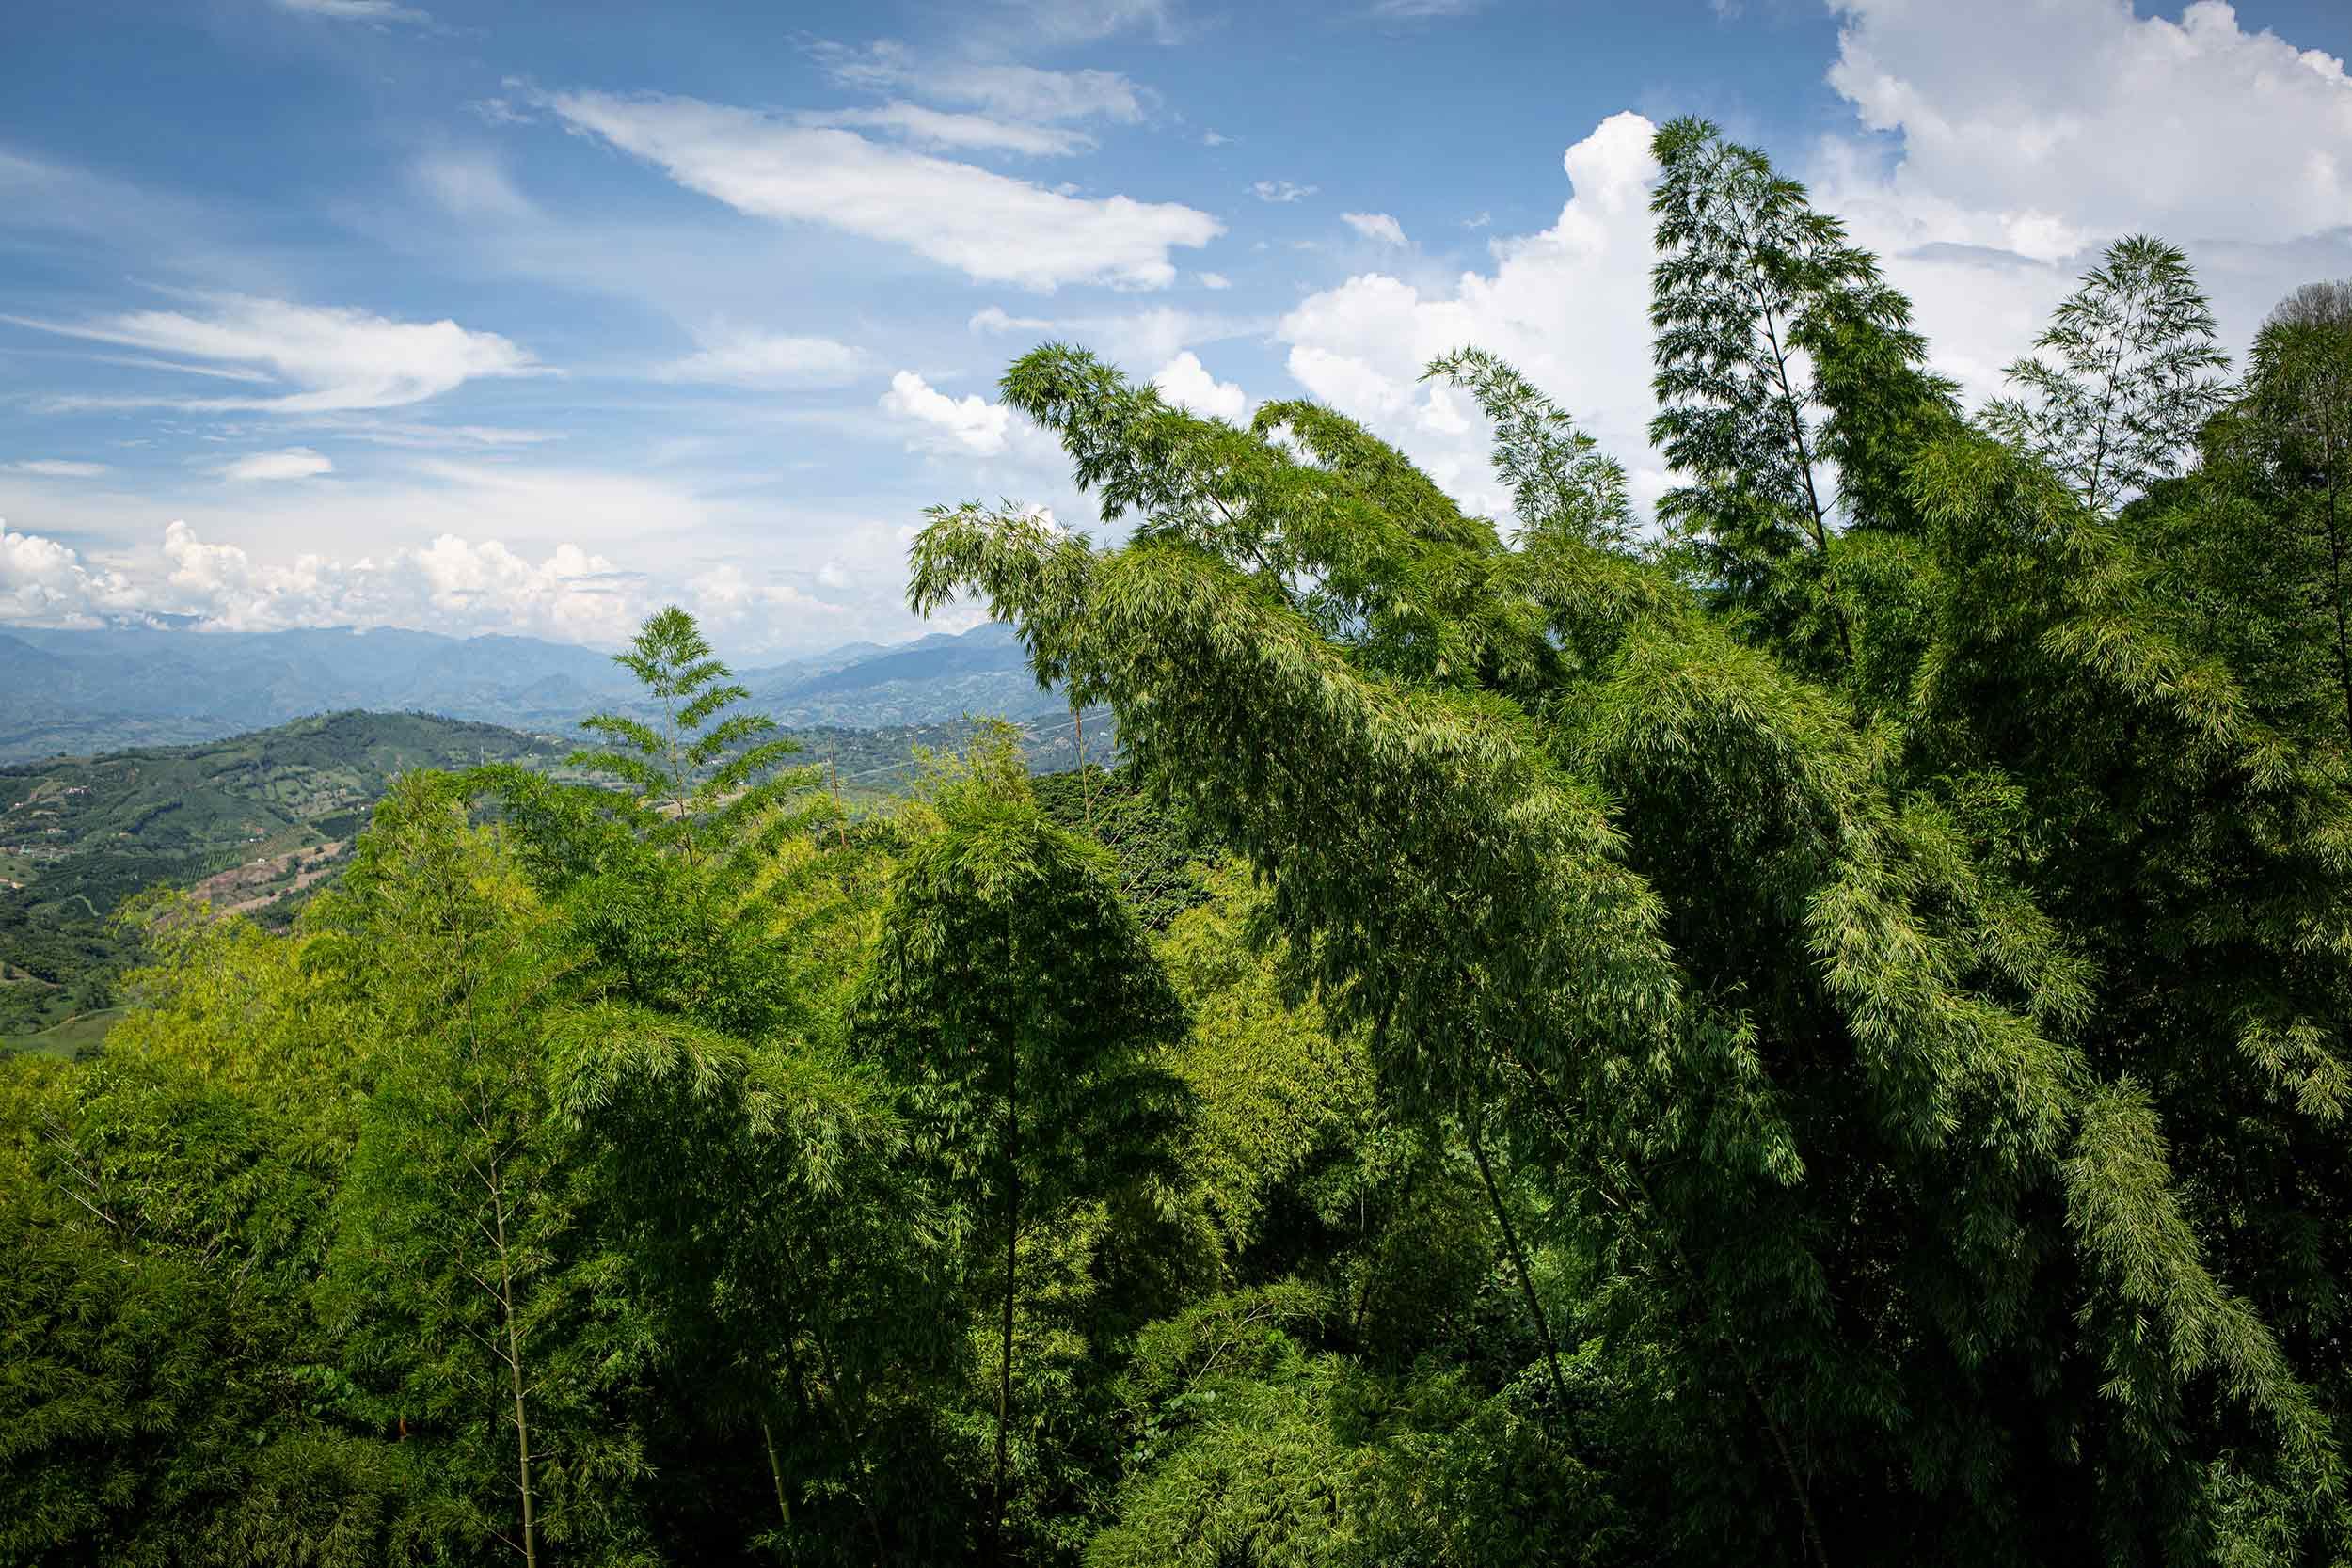 Guaduales und Bioversität beim Kaffeeanbau in Kolumbien. CafCaf Kaffeeblog